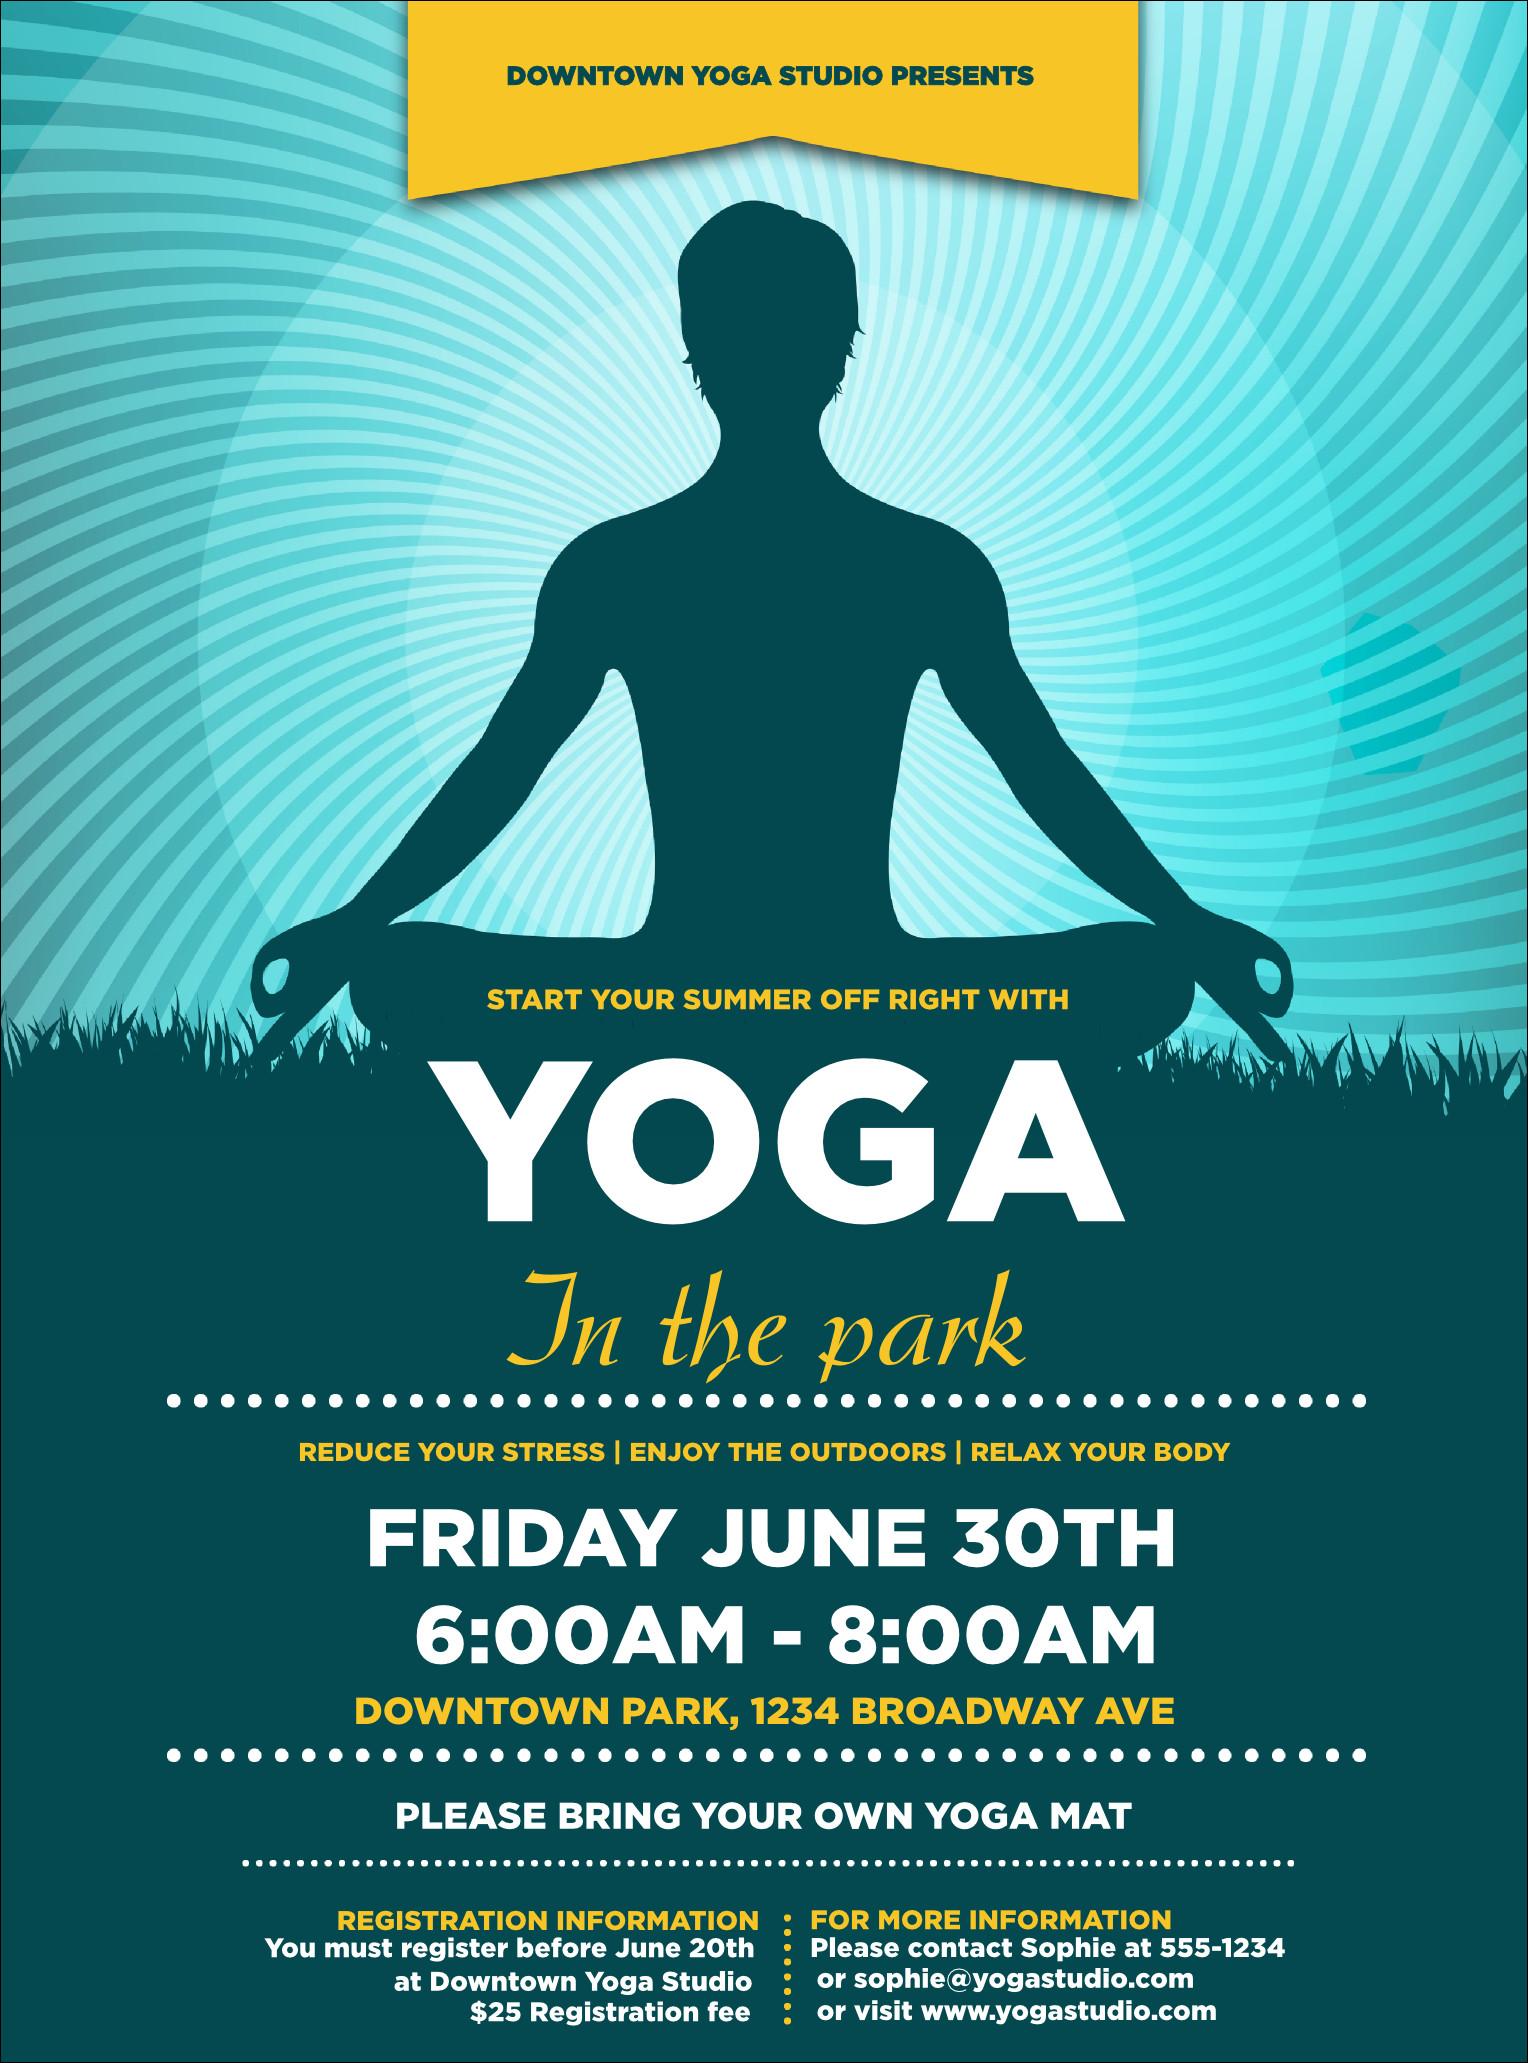 Yoga Flyers Free Template Yoga Meditation Flyer